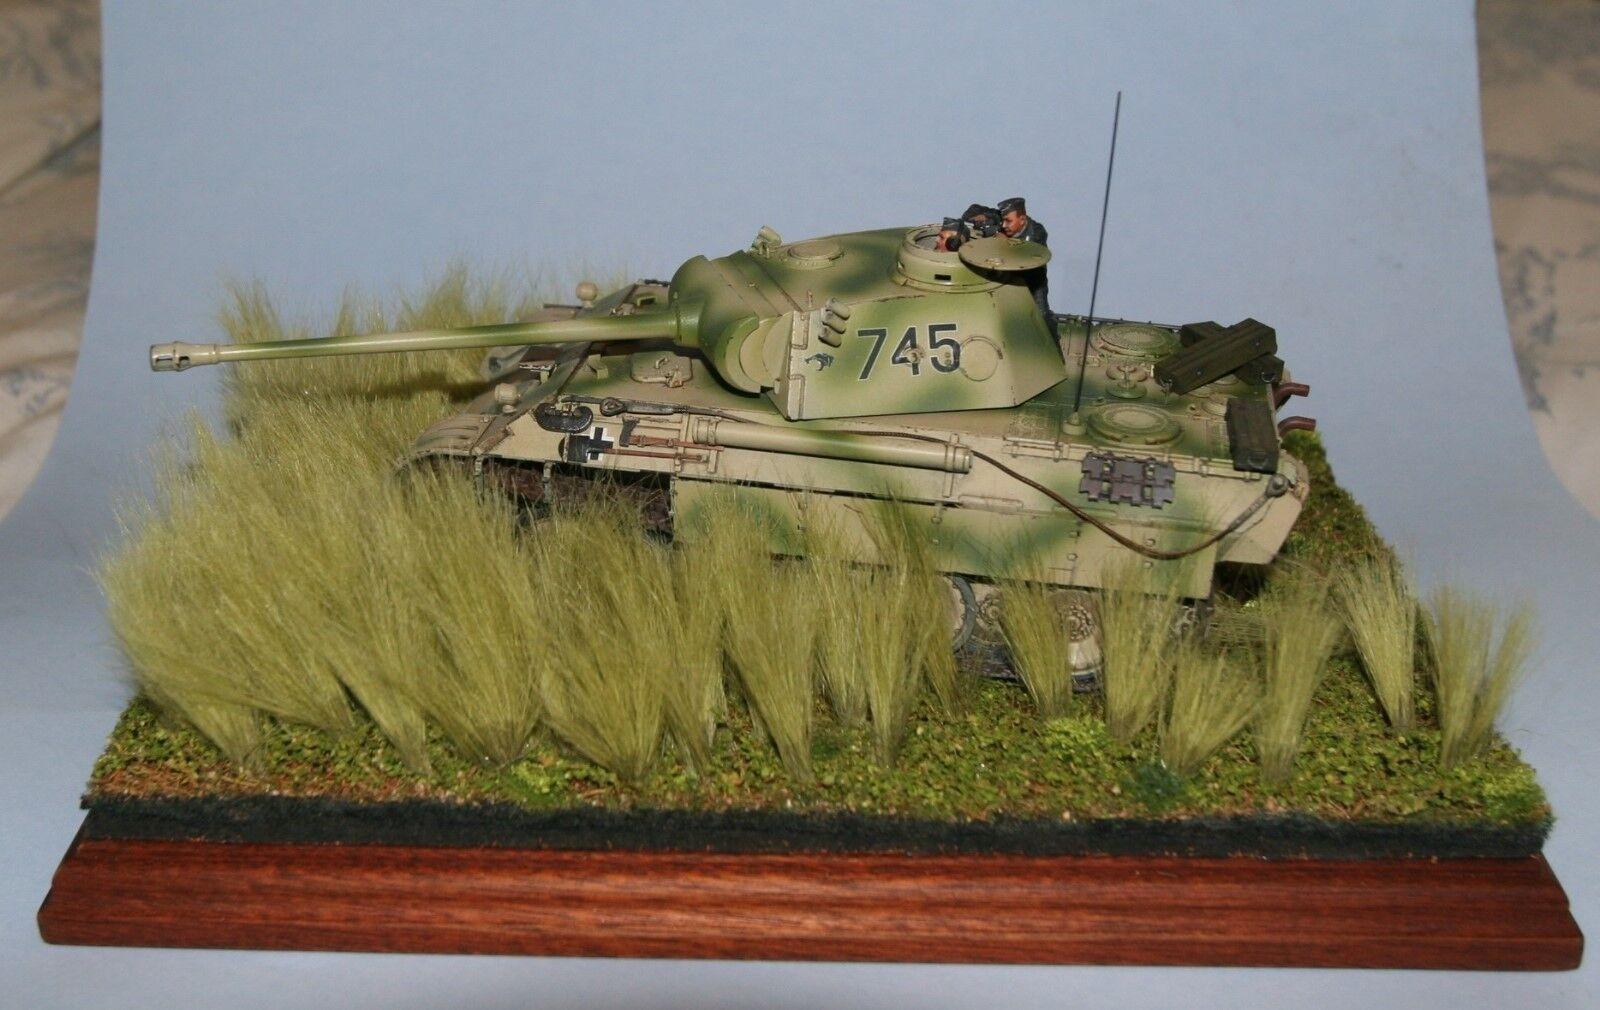 Tamiya pz. Kpfw V Panther Ausf. D en Kursk  2 Crew y Pro construido